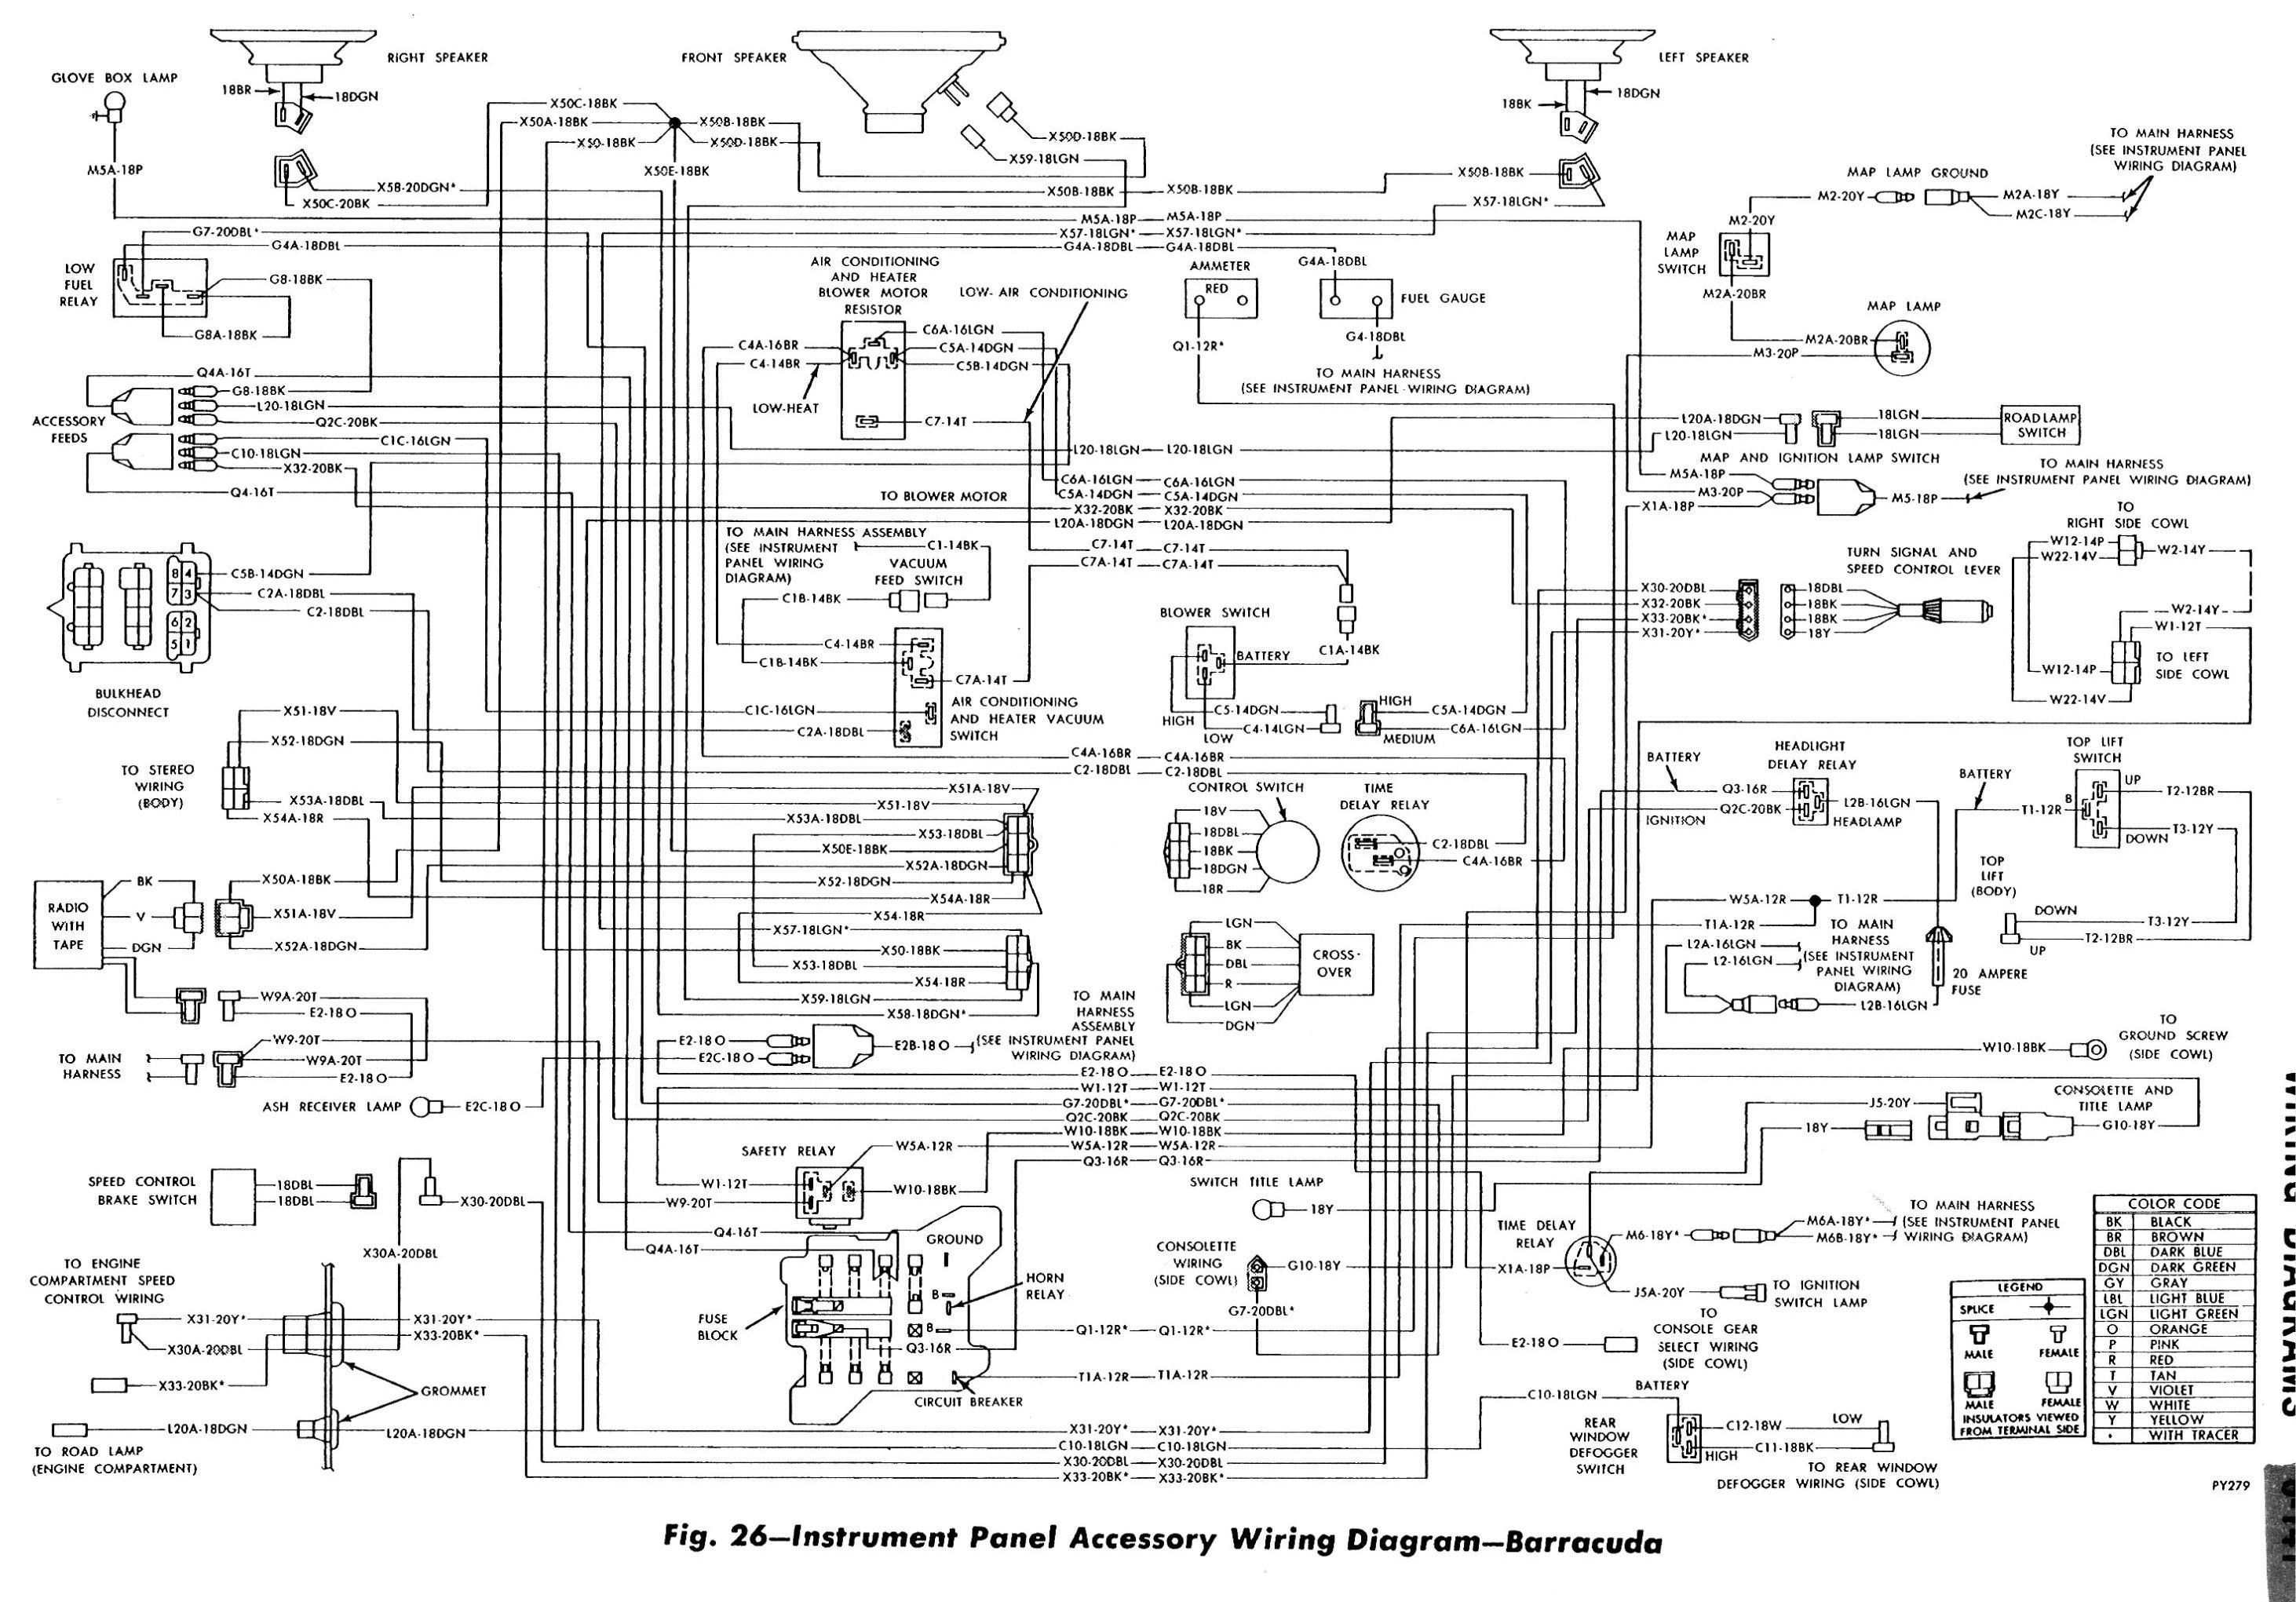 1964 cuda wiring harness wiring diagram g11 1965 Dodge Dart Radio 70 cuda wiring diagram 20 16 depo aqua de \\u2022 1963 cuda 1964 cuda wiring harness